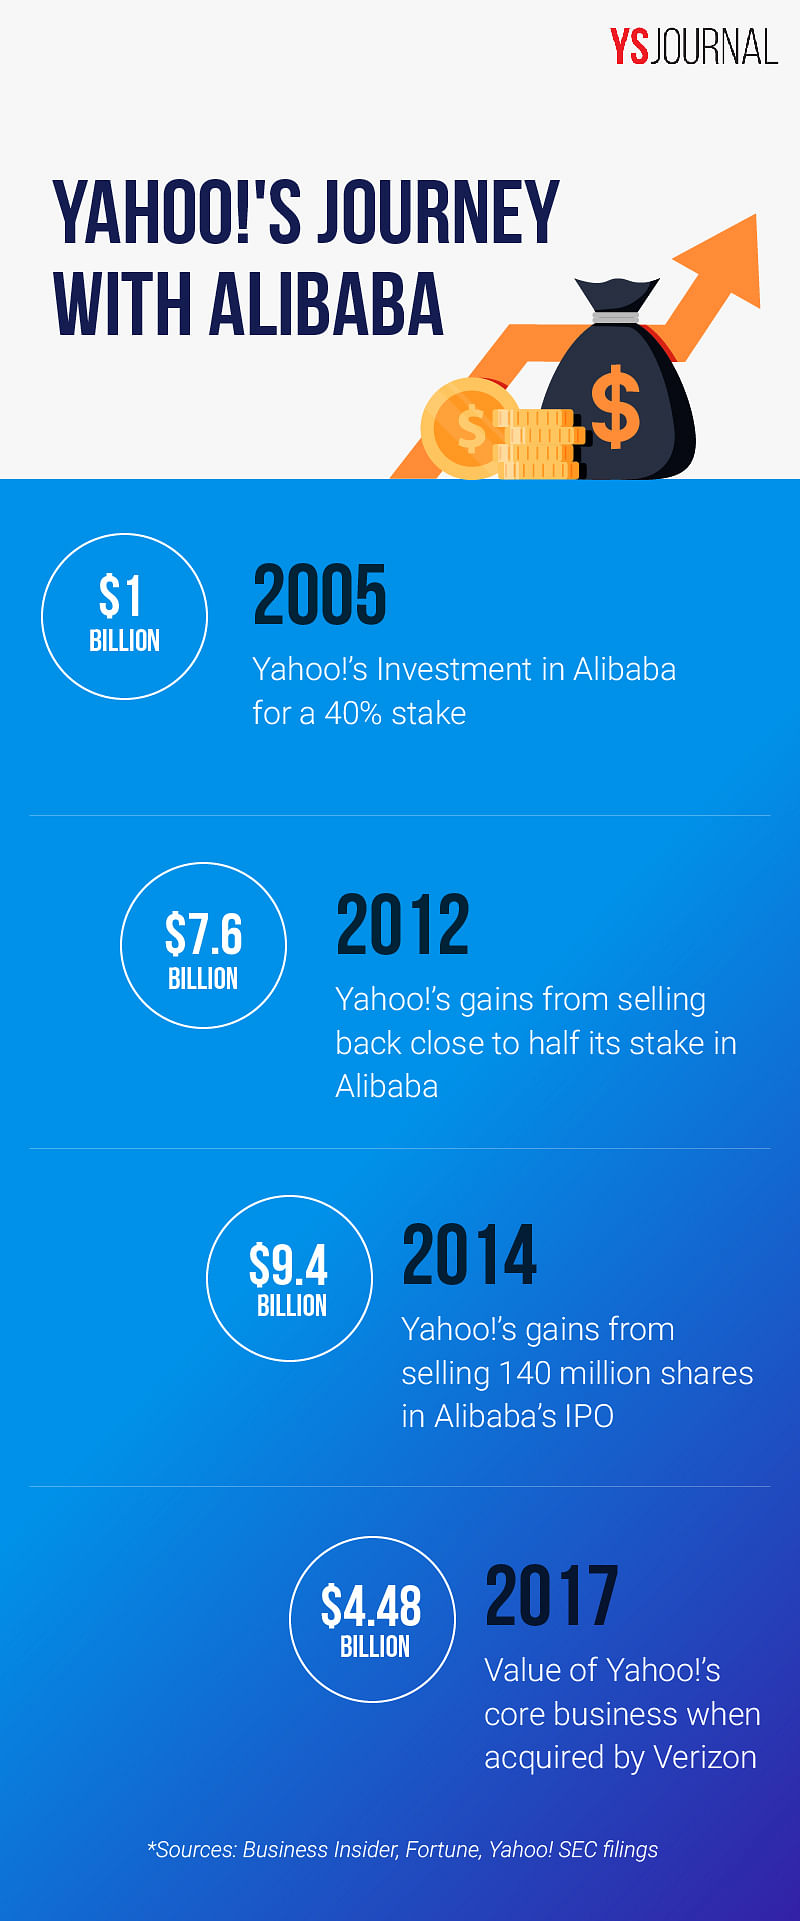 Yahoo's Journey with Alibaba